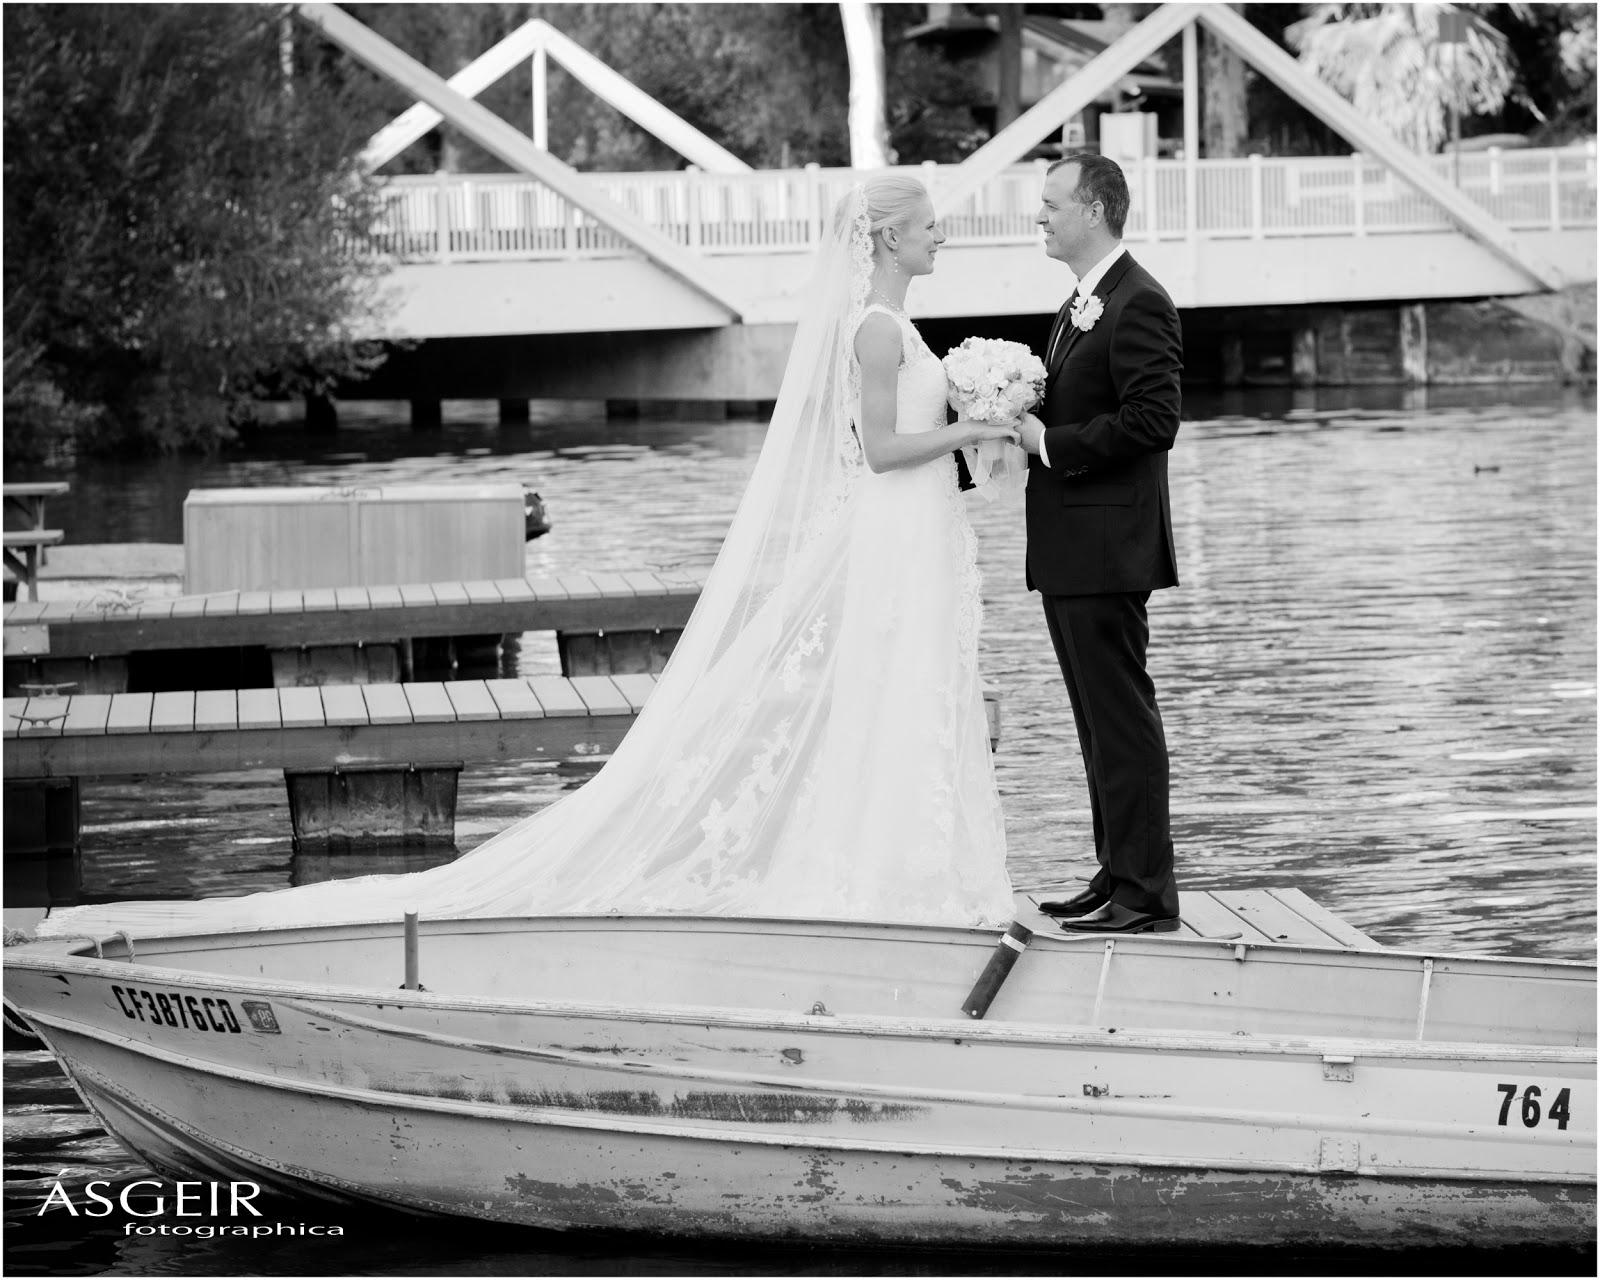 Asgeir Fotographica Wedding grapher Asgeir Bollason